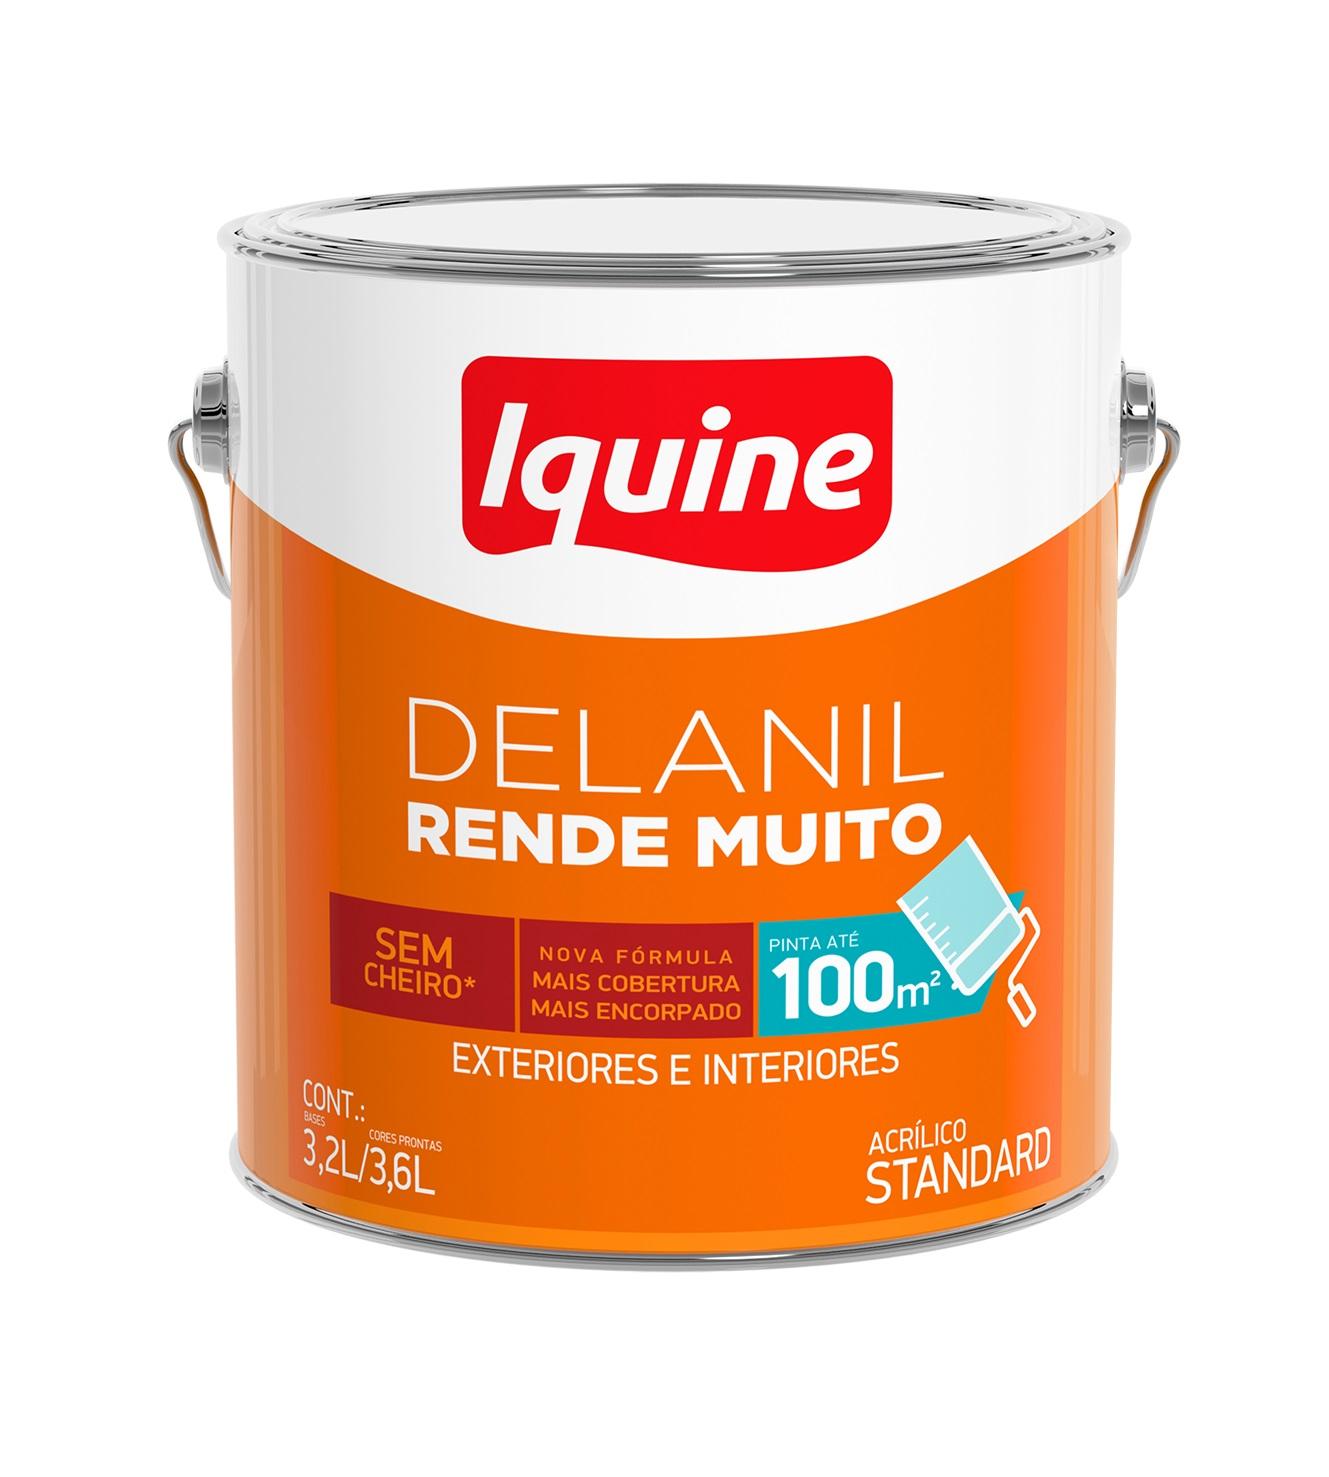 Tinta Base Delanil Rende Muito 3,2L